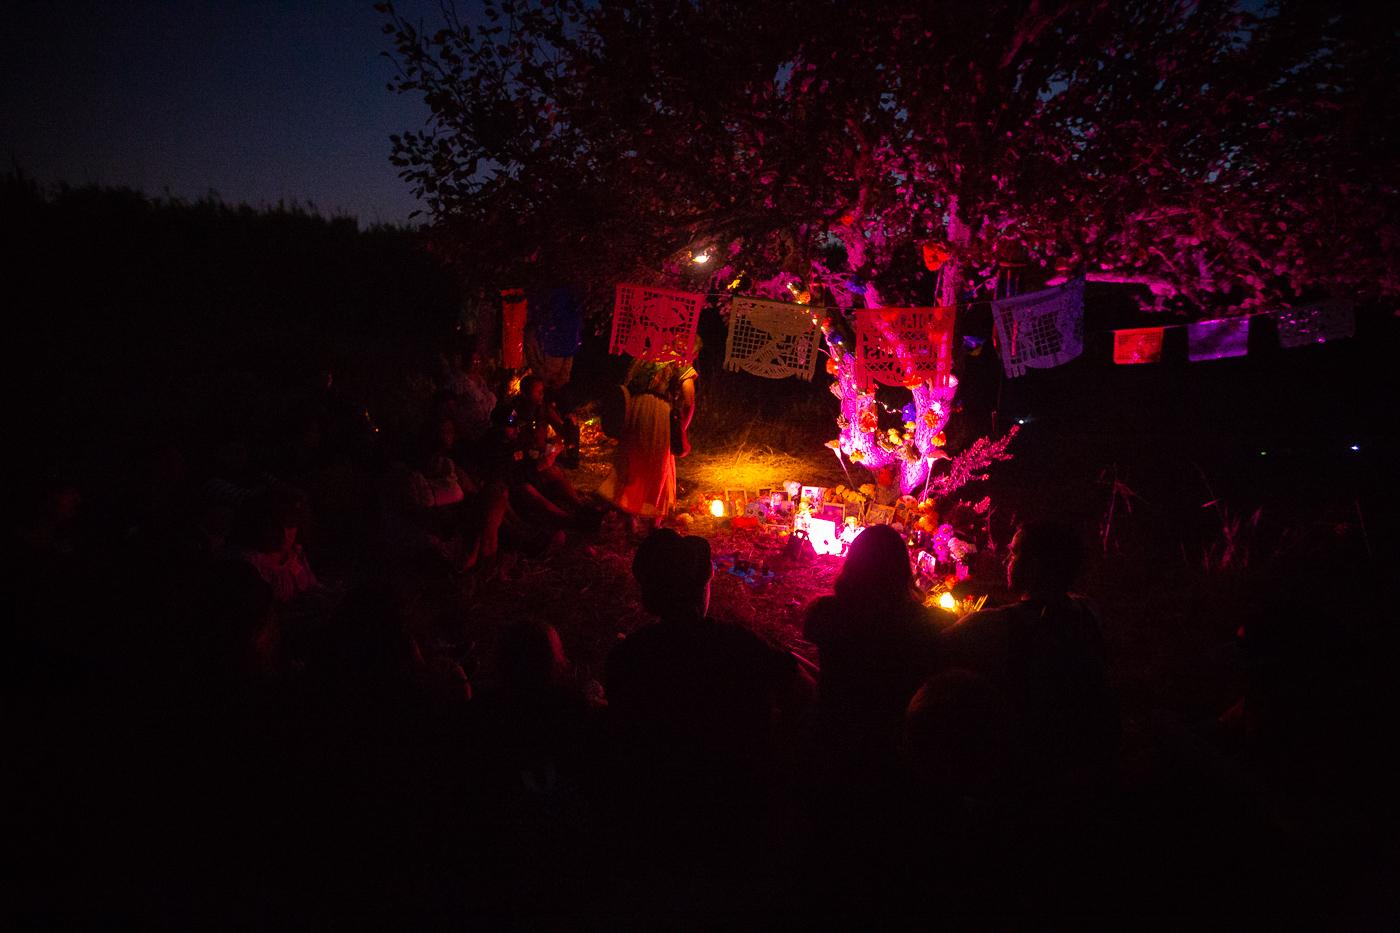 ohtli en MAR 2018 (Sines, Portugal) - Foto de Alípio Padilha11.jpg